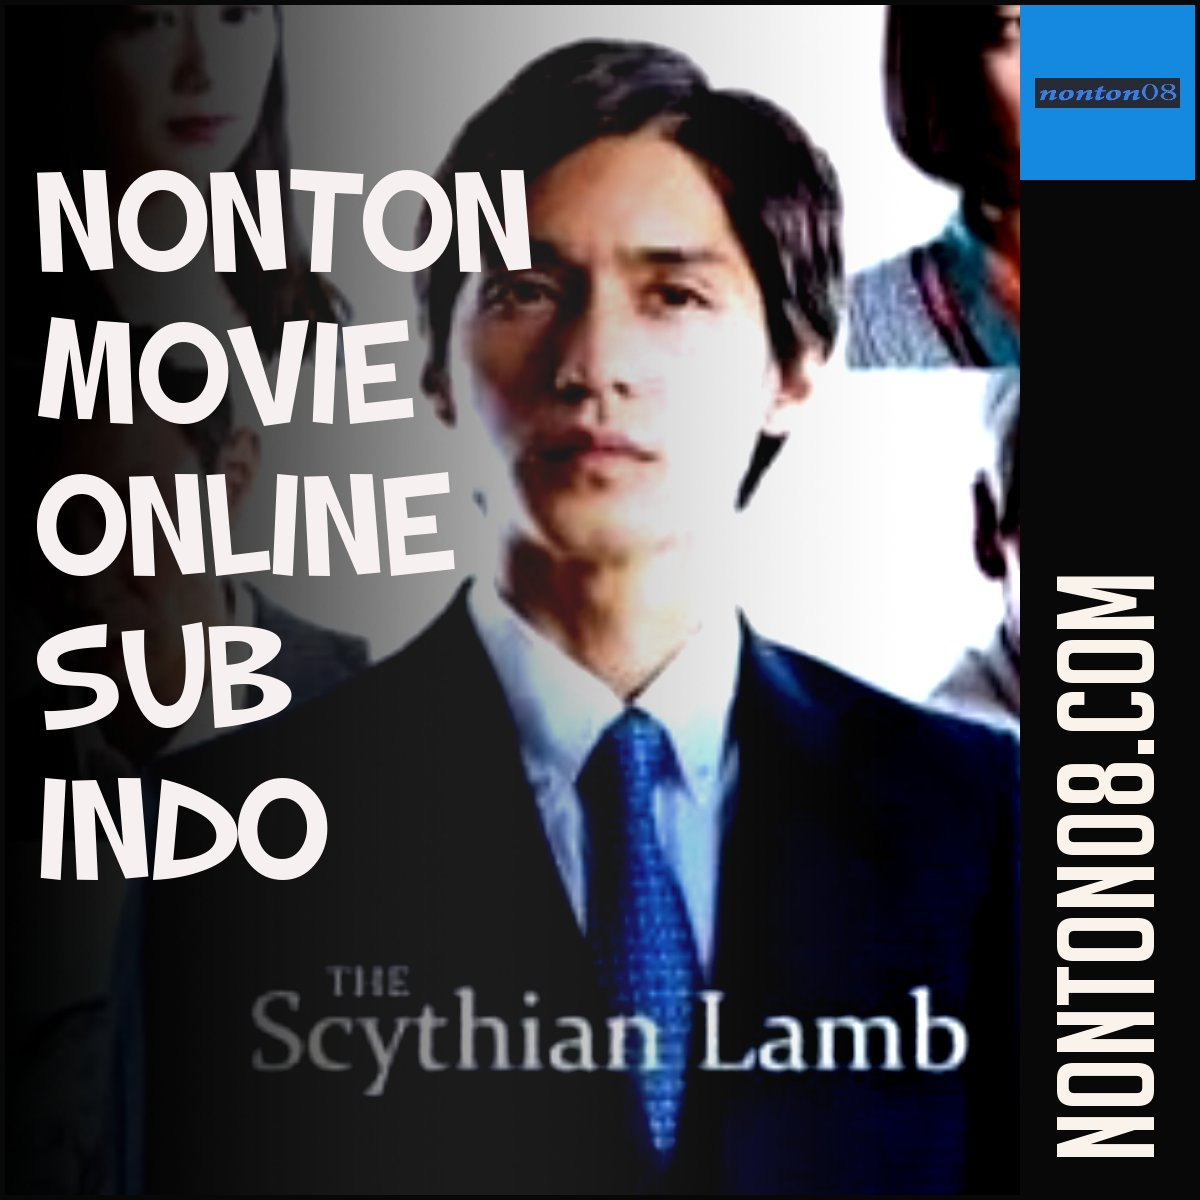 Nonton Film Online 2018